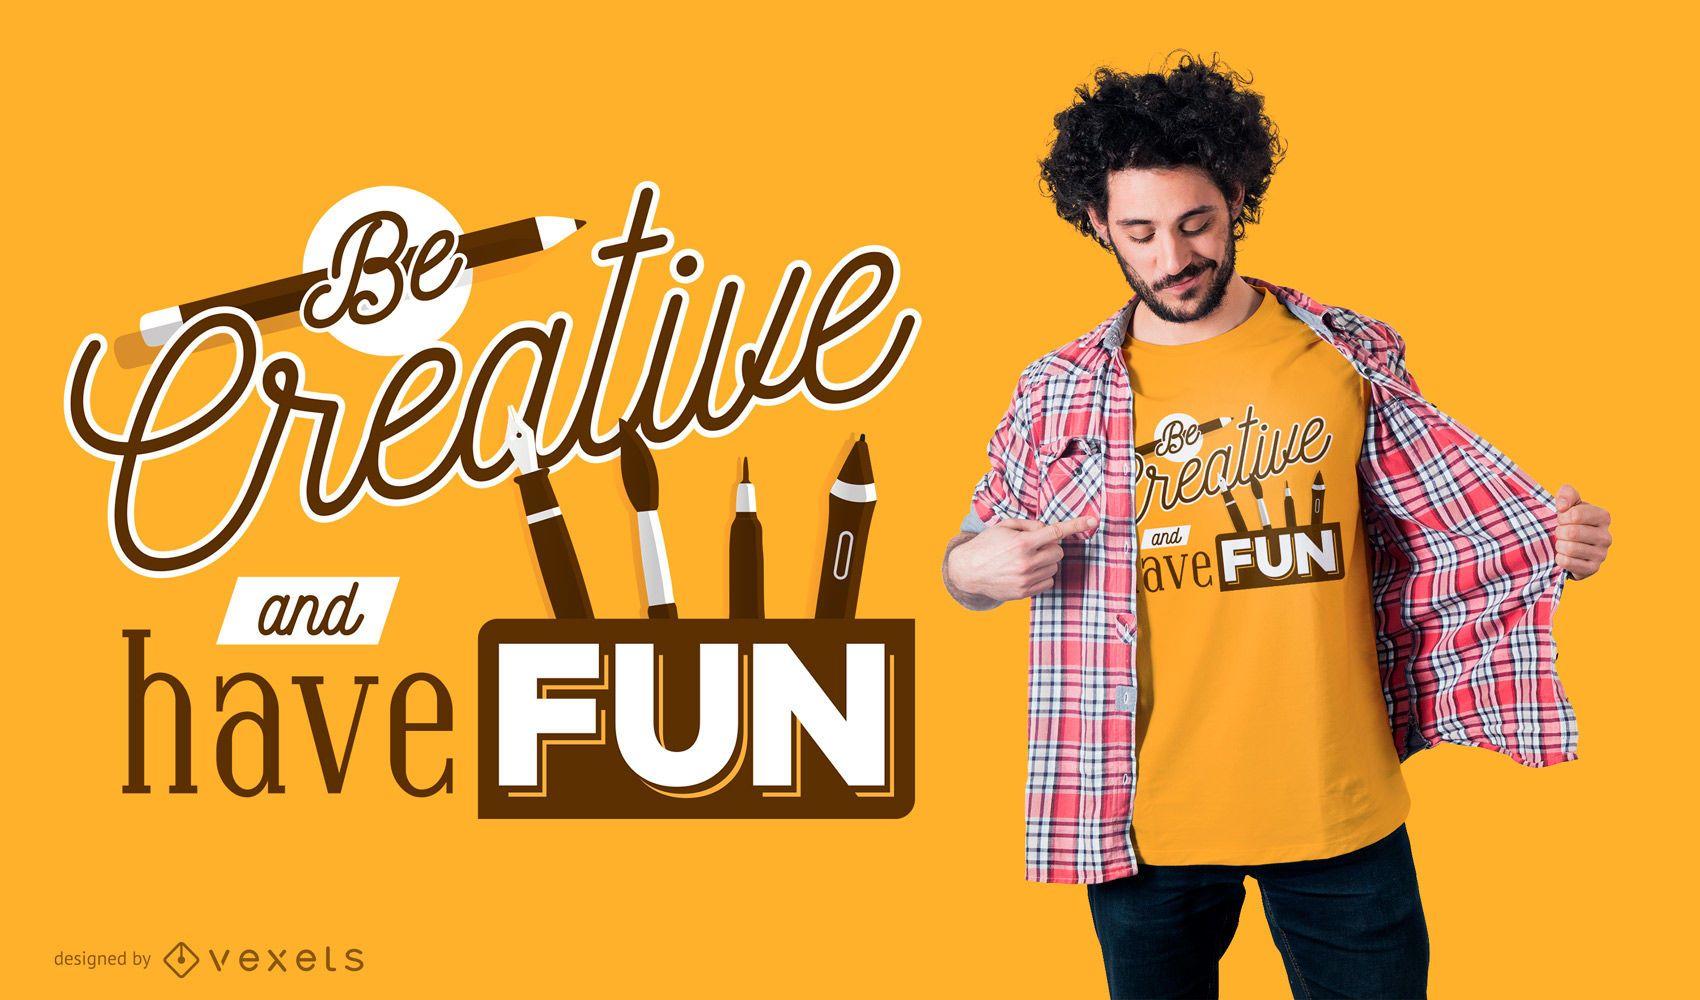 Be Creative School T-shirt Design